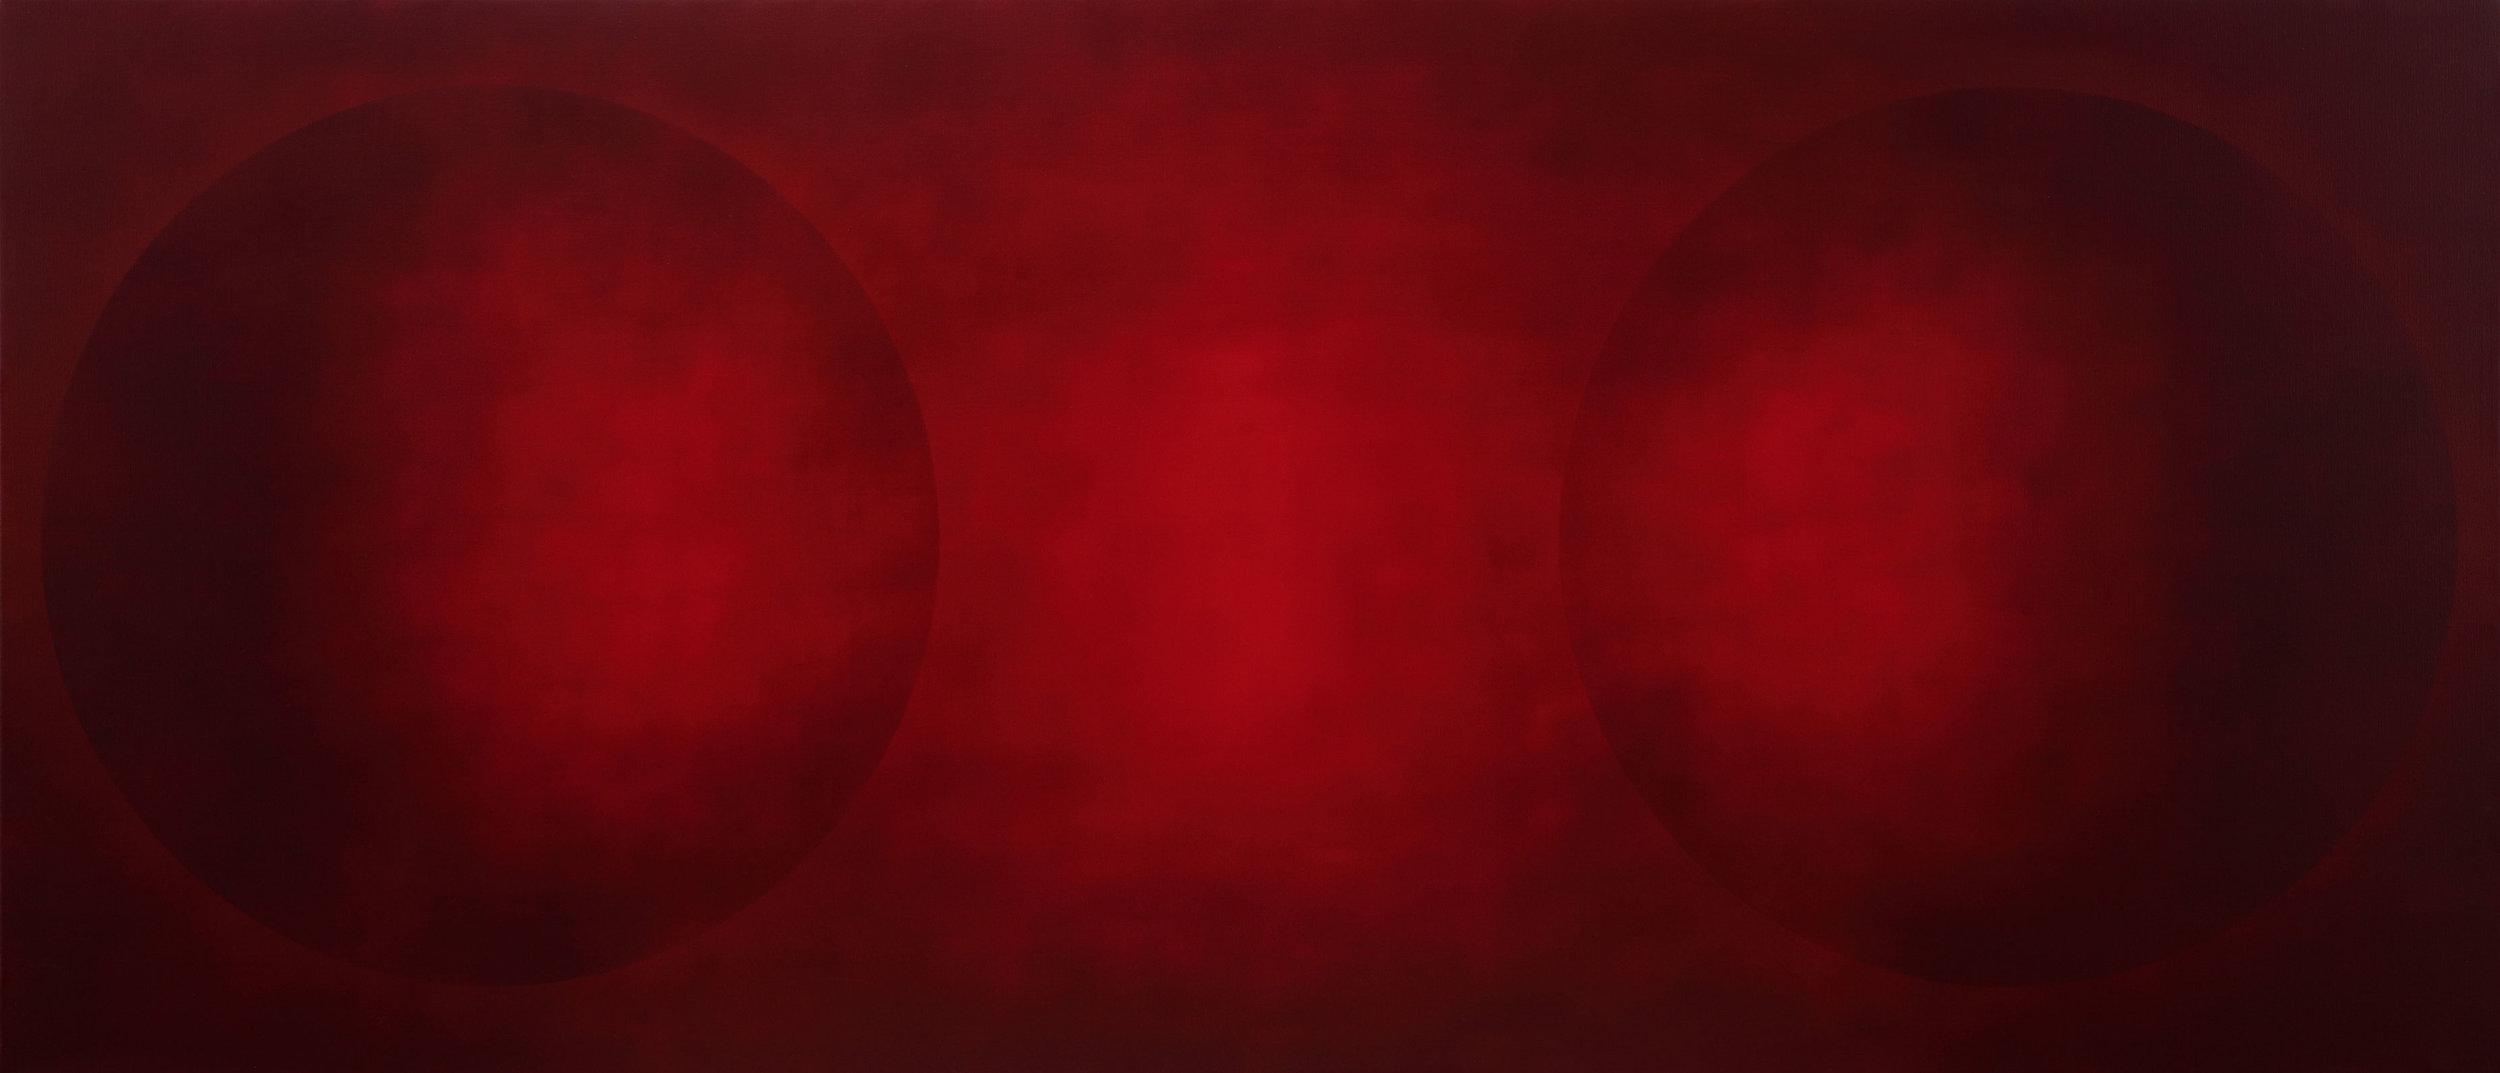 INTERVAL MF CV  2011 - 2013 130x300 cm  private collection